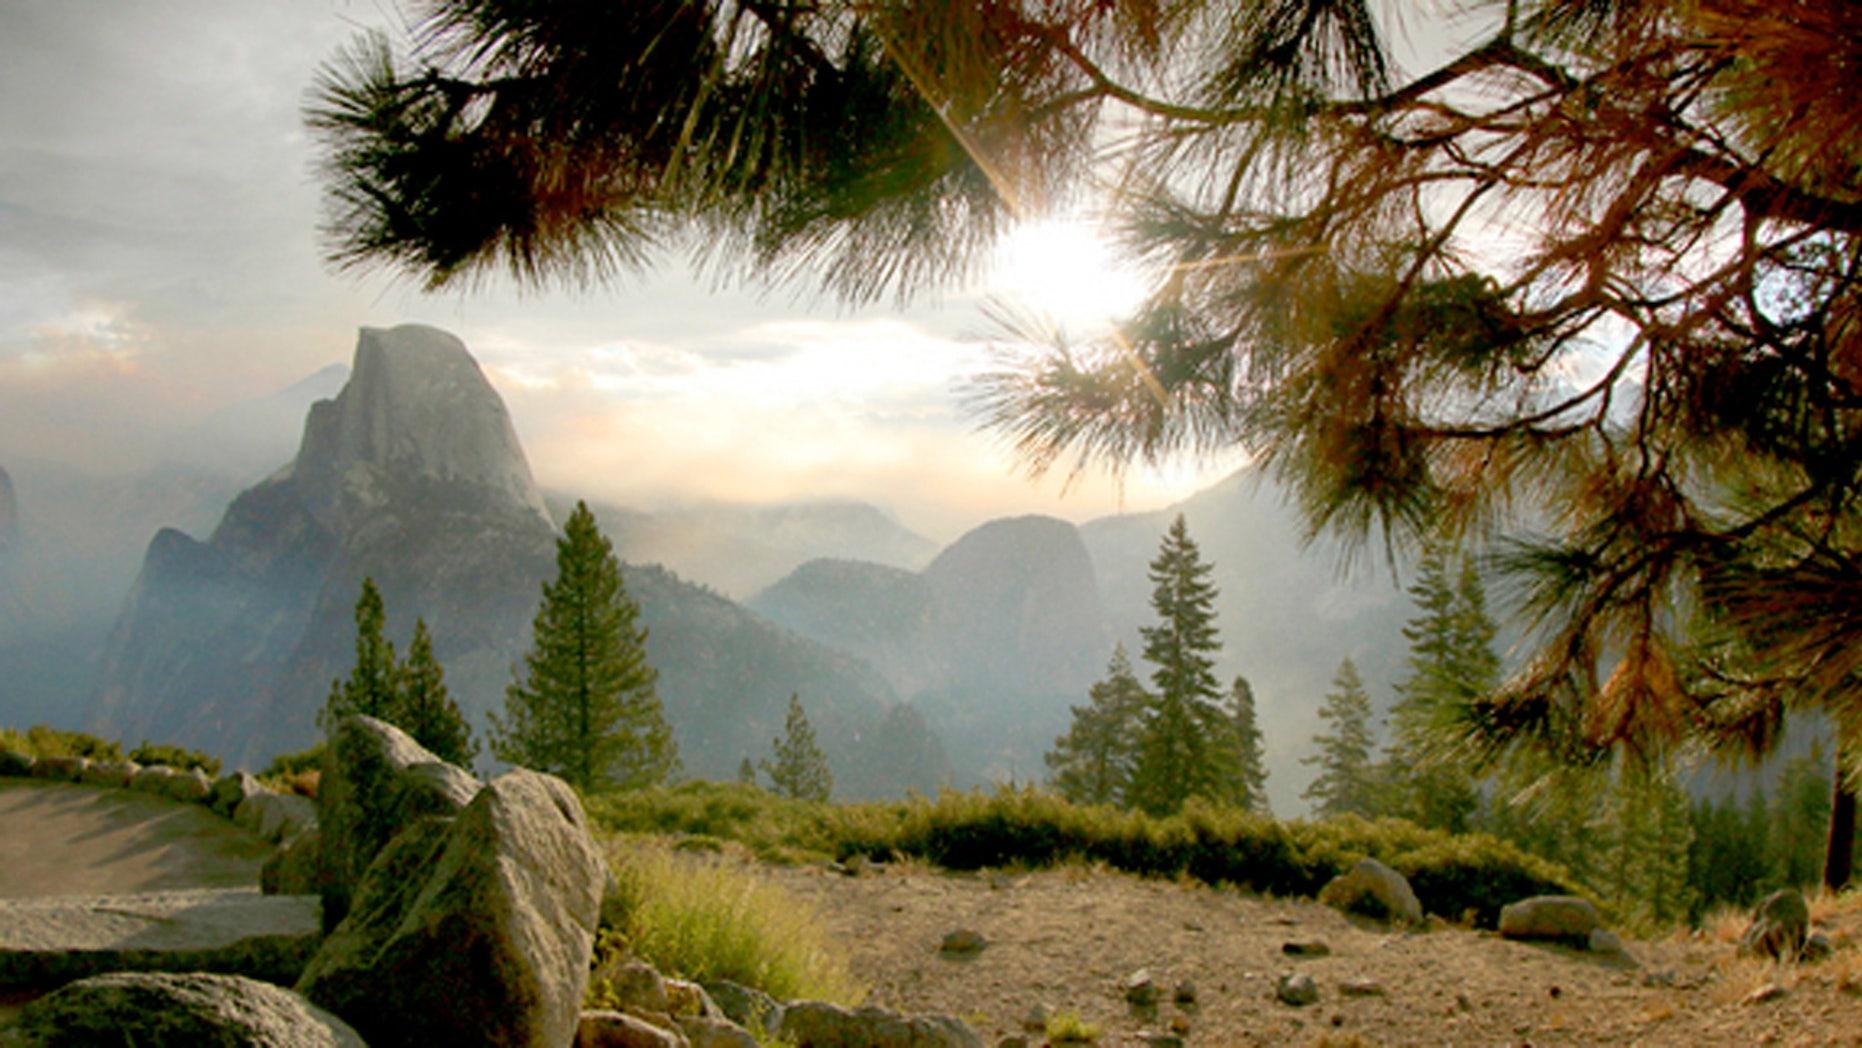 Mist over Half Dome in Yosemite National Park.